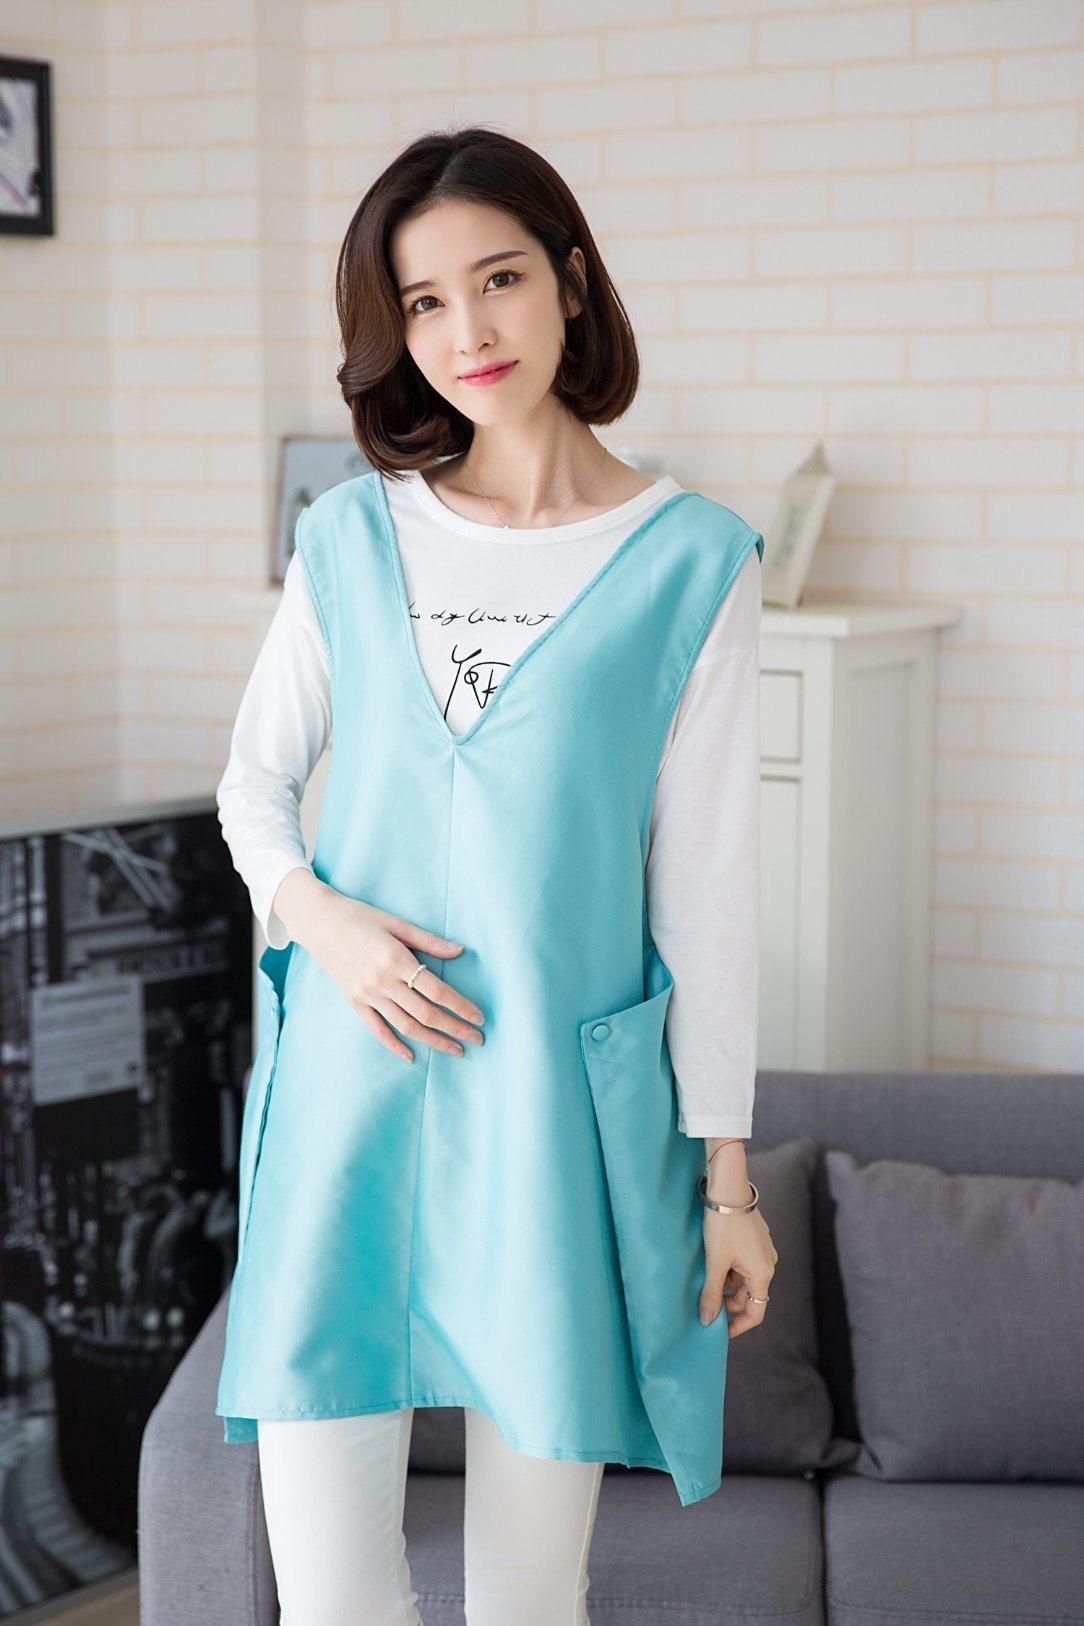 2017 Pma Silver Fiber Anti-Radiation Maternity Clothes